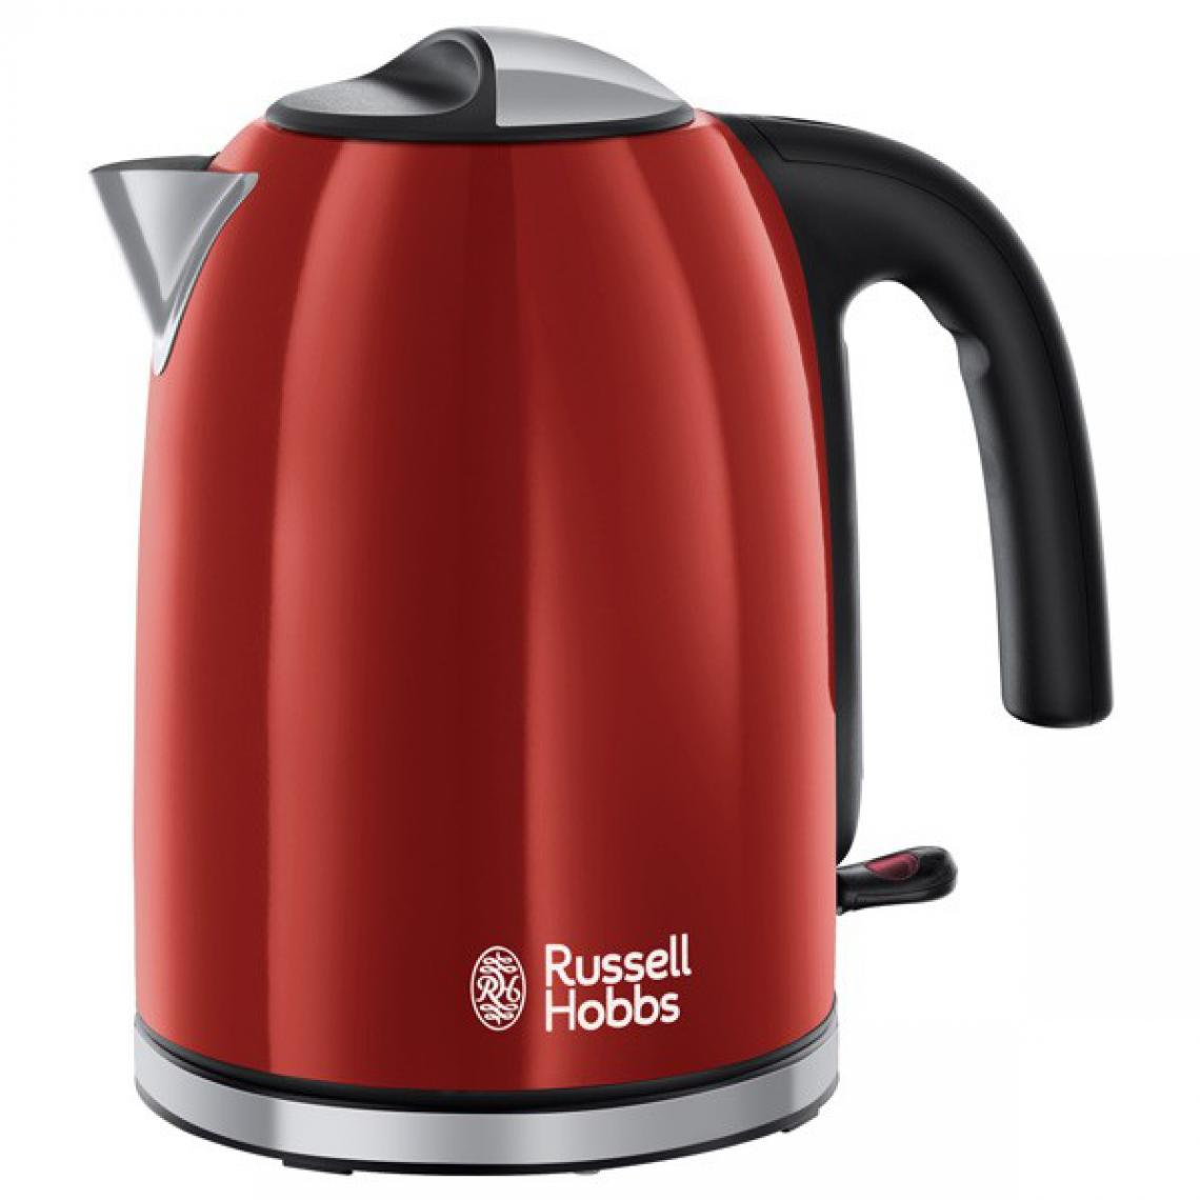 Russell Hobbs Bouilloire Russell Hobbs 222222 2400W 1,7 L Rouge Acier inoxydable (1,7 L)